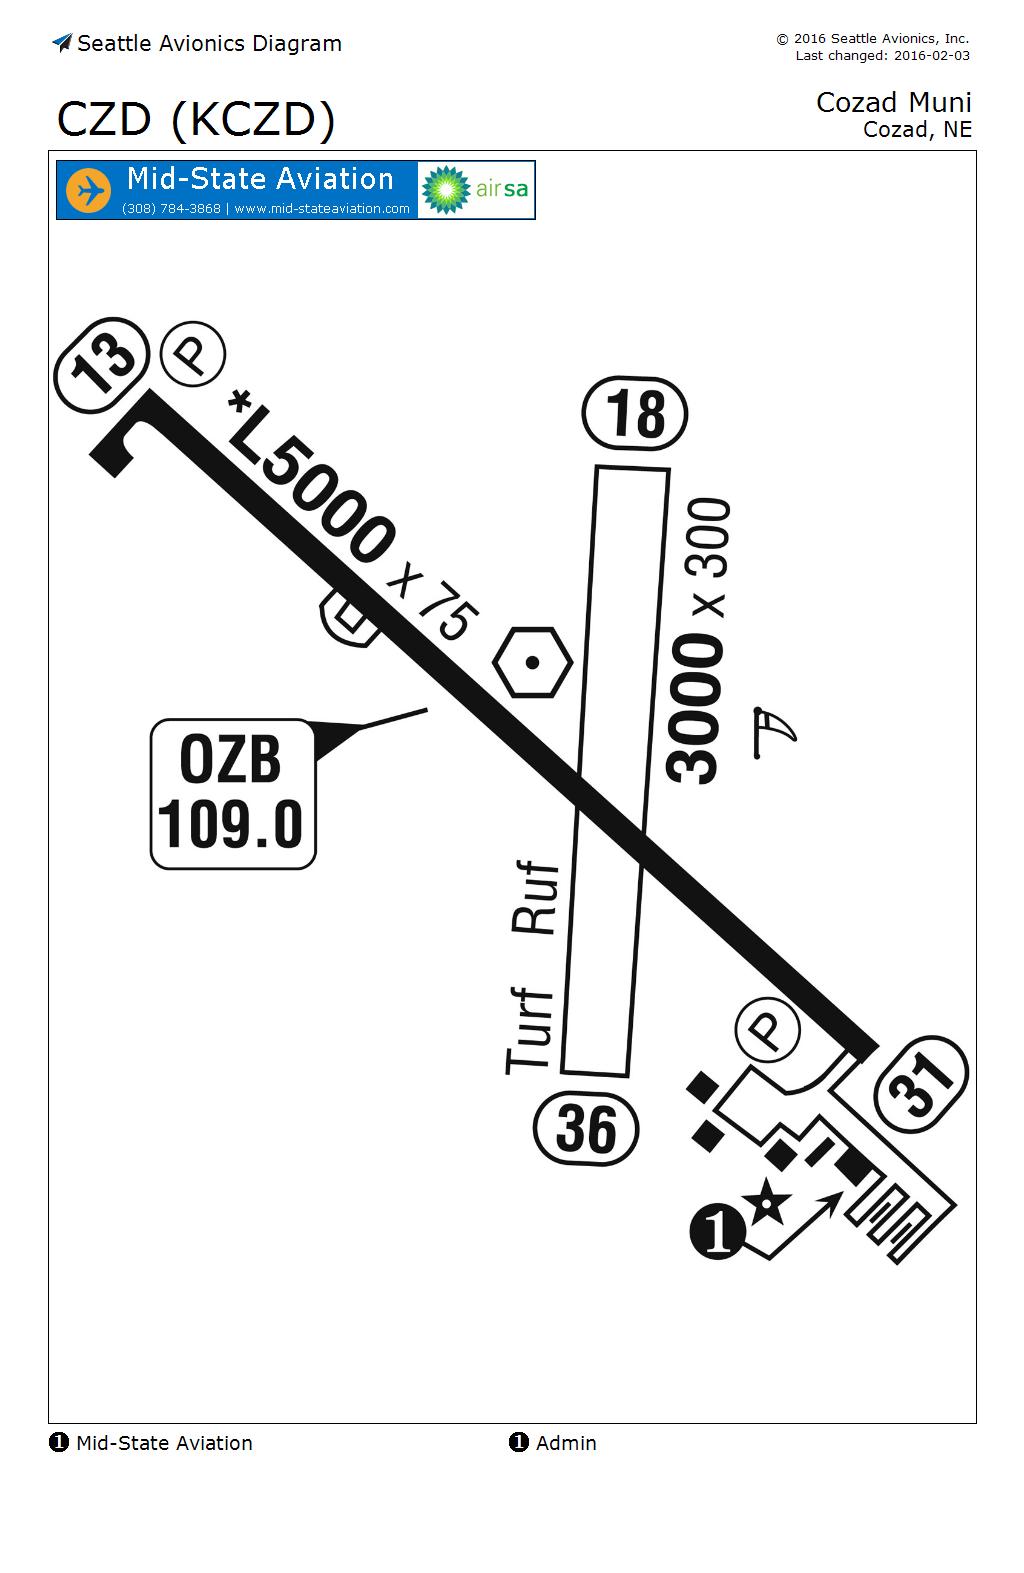 seattle avionics airport guide